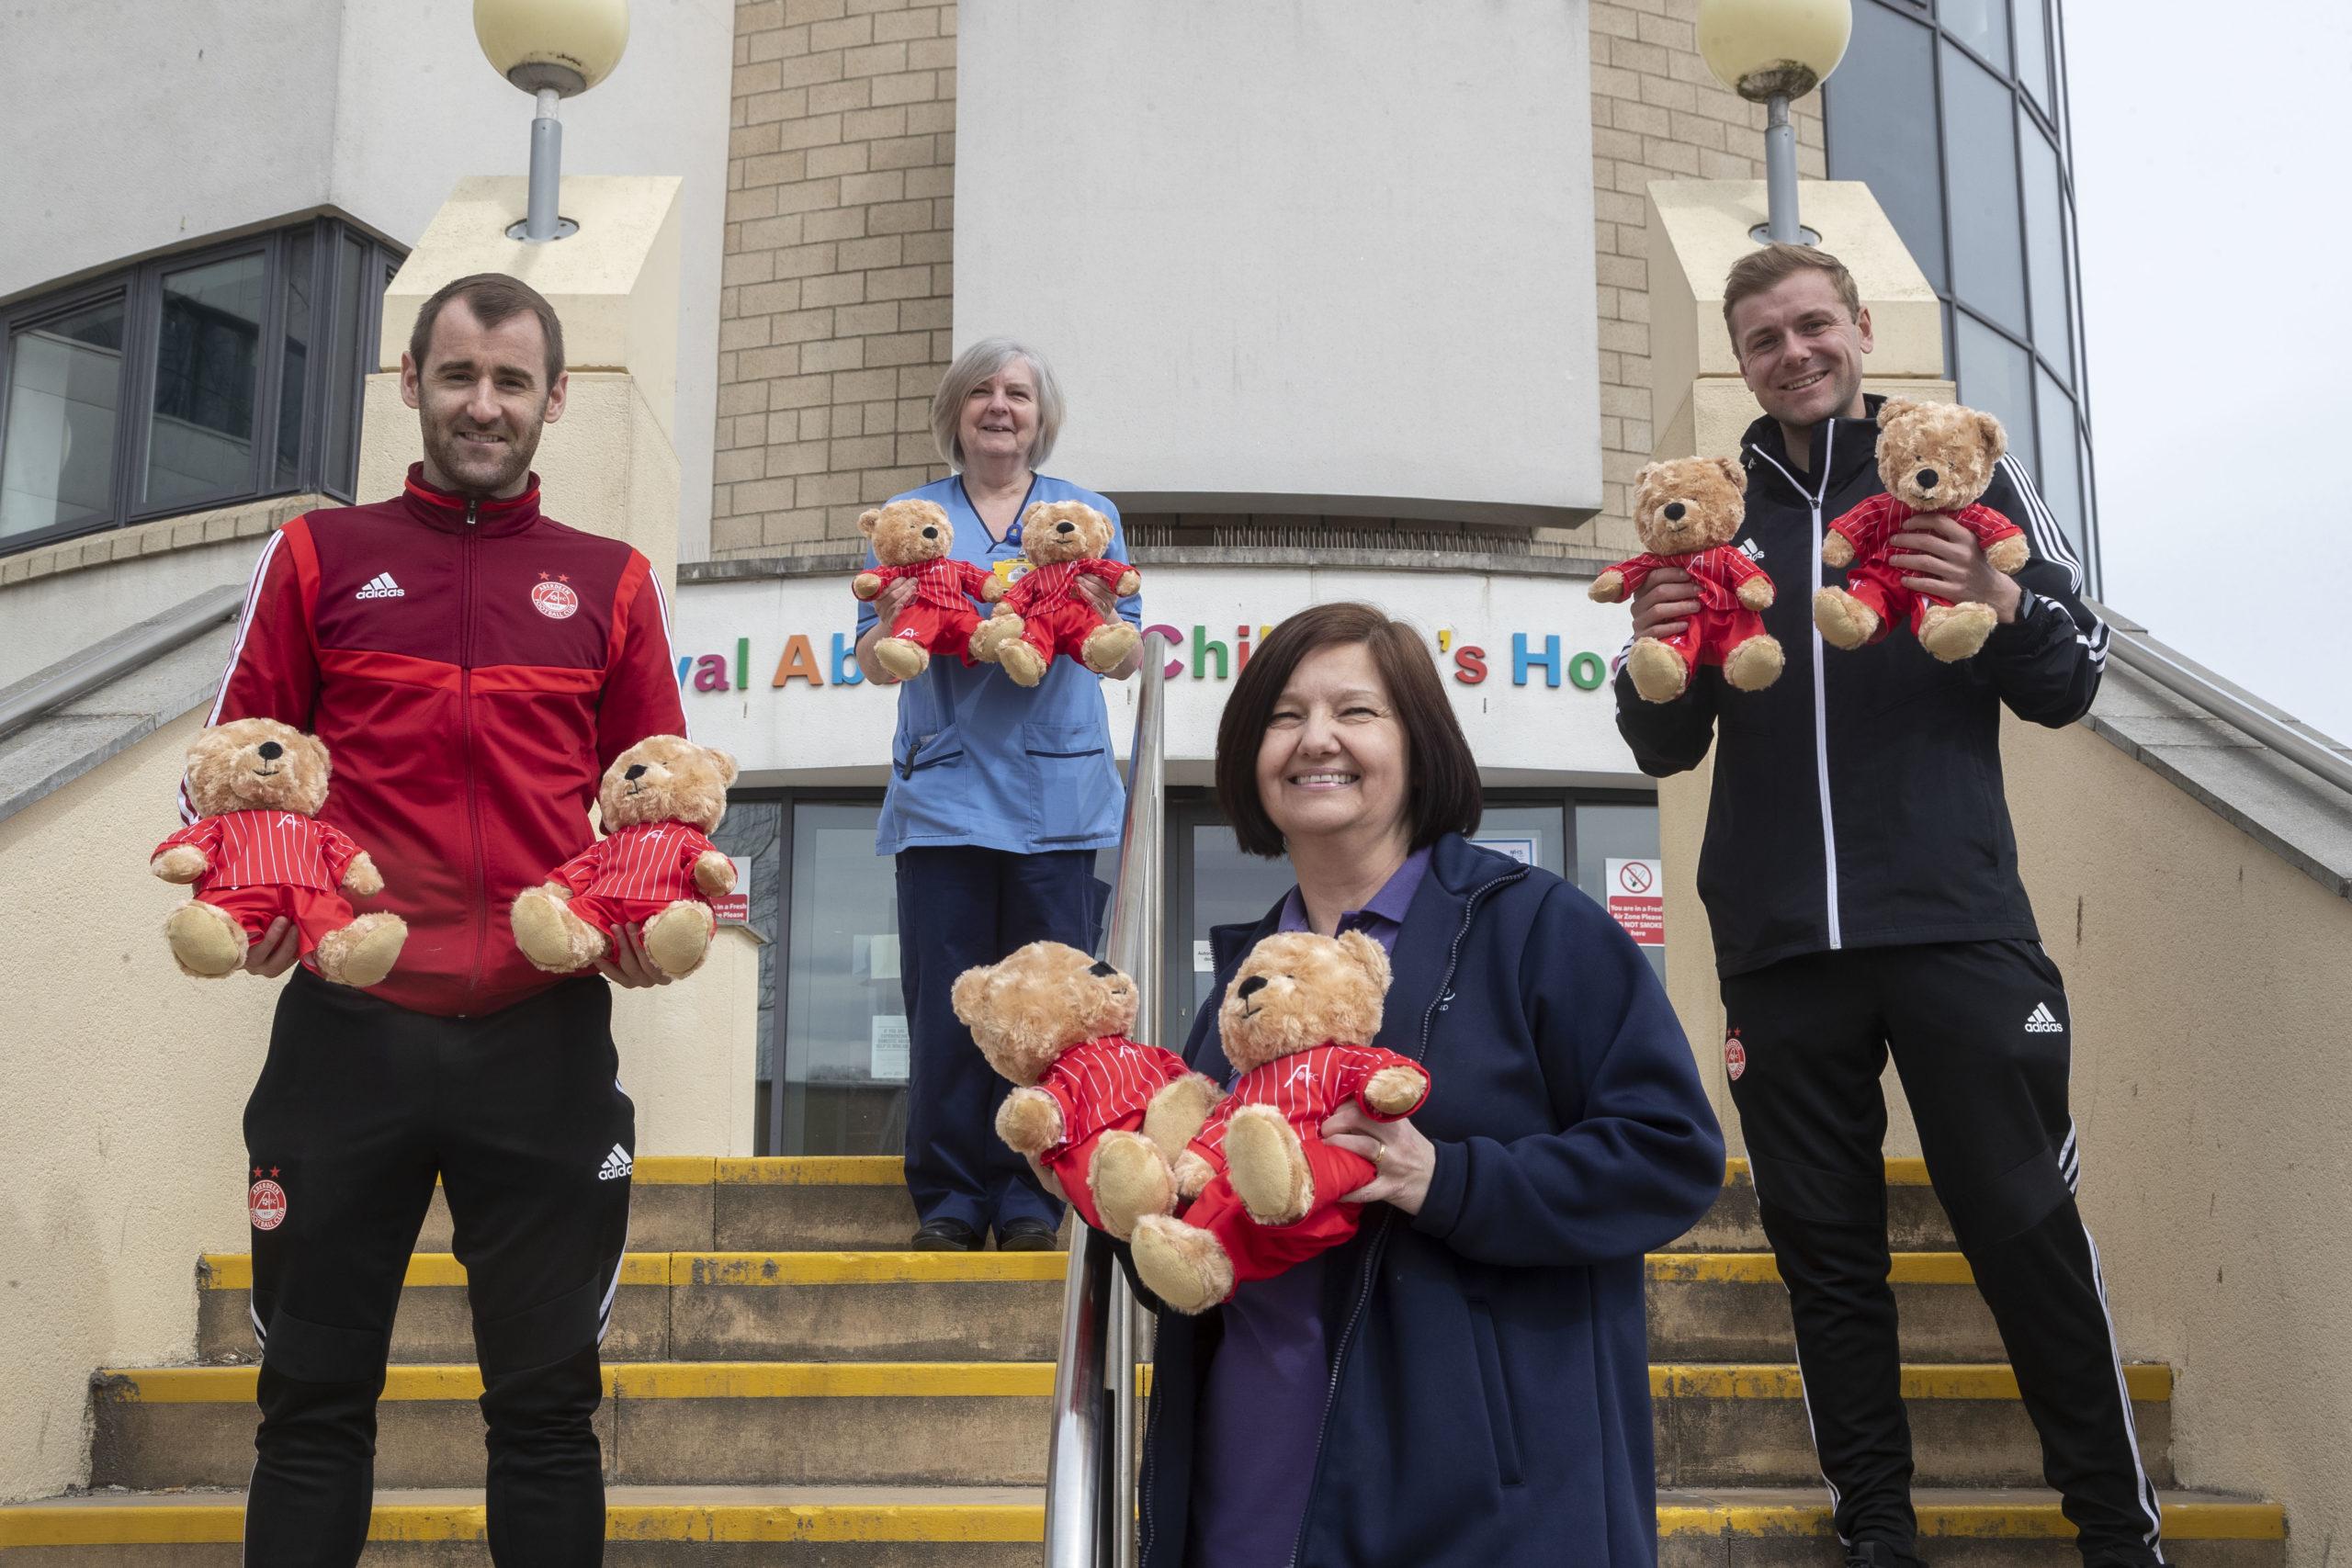 Ena Cromar, Scott Duncan, Niall McGinn, Heather Beattie  Picture by Derek Ironside  / NEWSLINE MEDIA